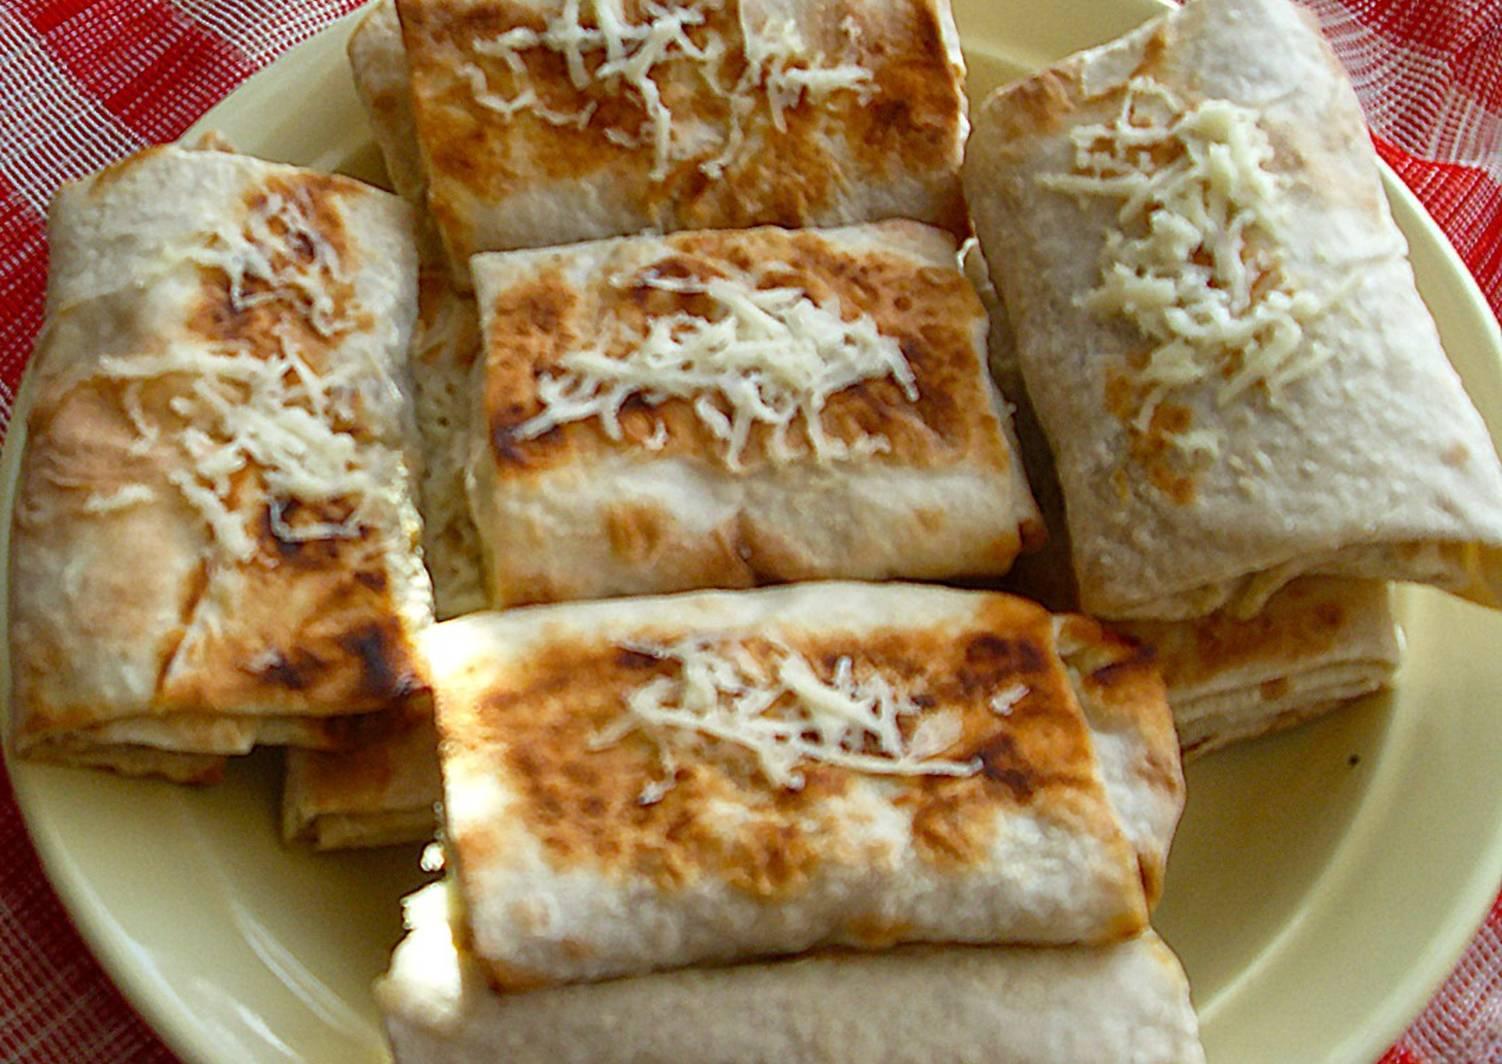 сейчас там завтрак из лаваша рецепты с фото пошагово съемка